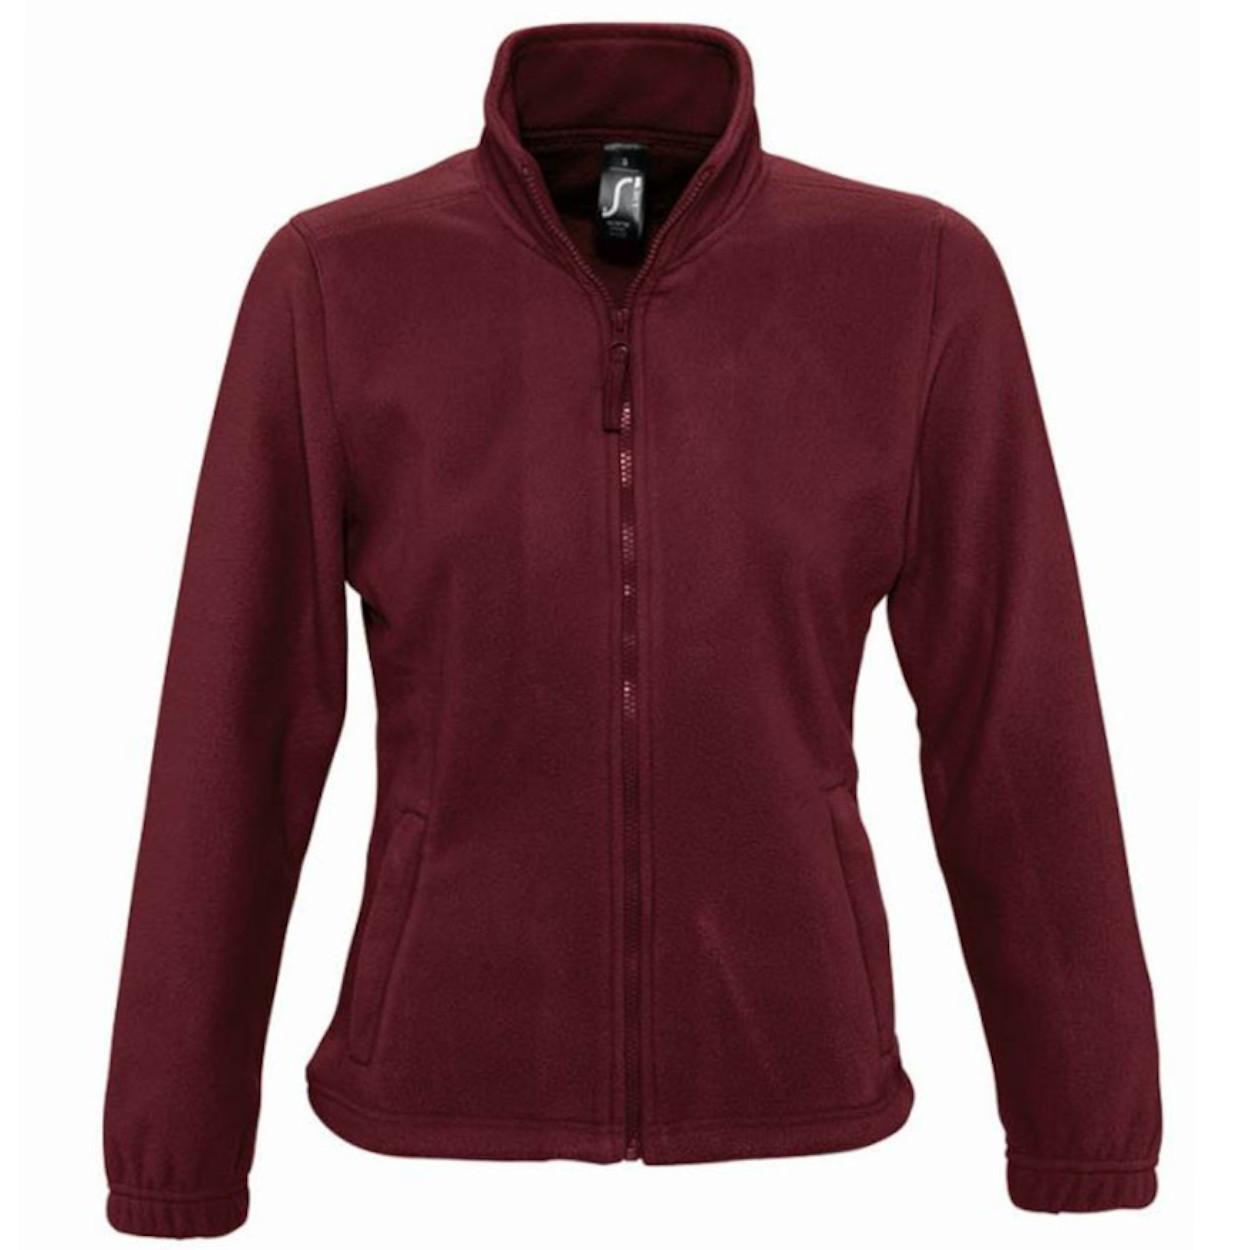 SOLS Womens/Ladies North Full Zip Fleece Jacket (S) (Burgundy)